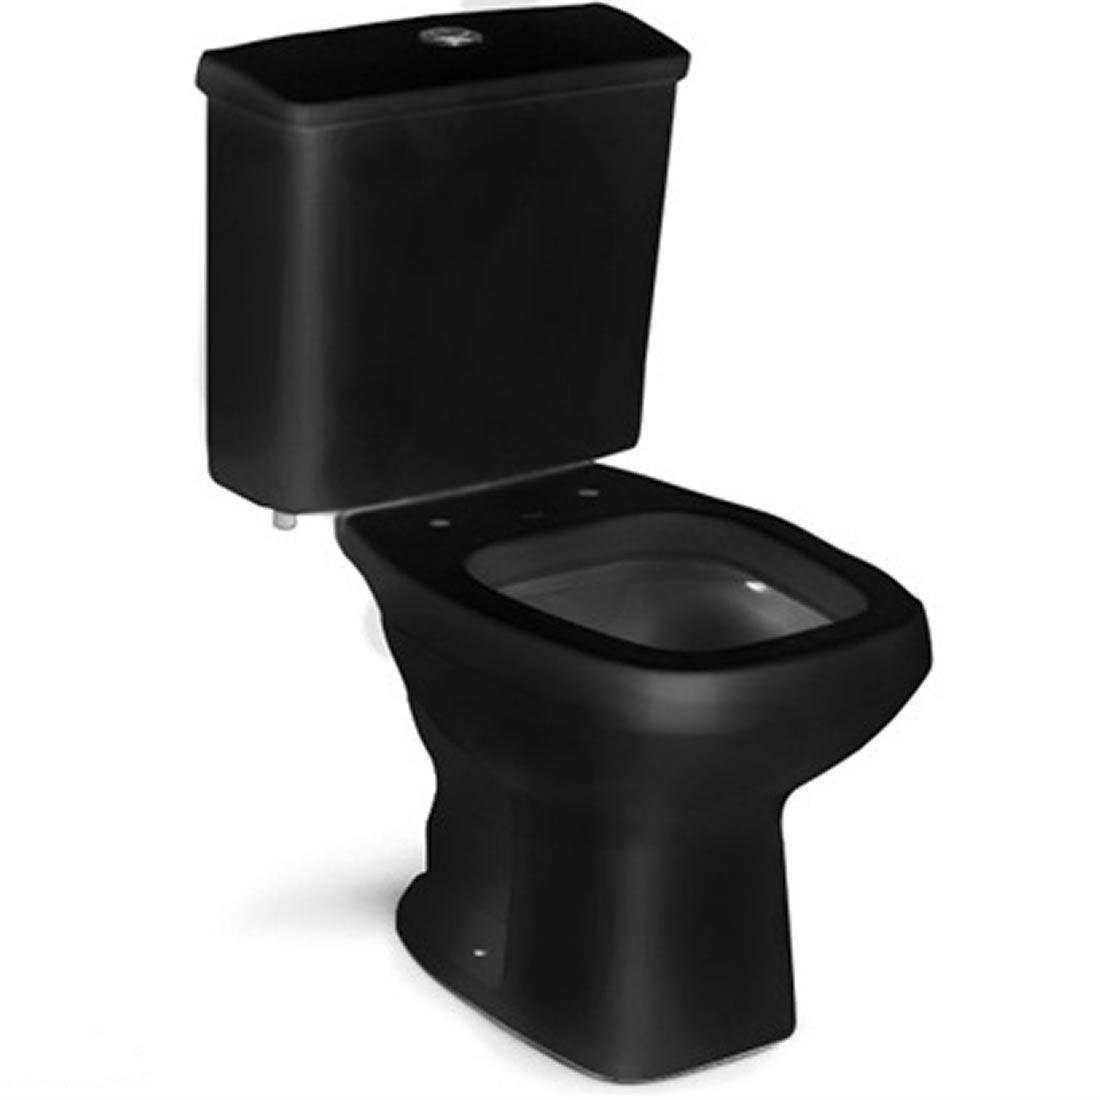 Conjunto Vaso Sanitário com Caixa Acoplada 3/6L Ecoflush City Plus Preto Celite